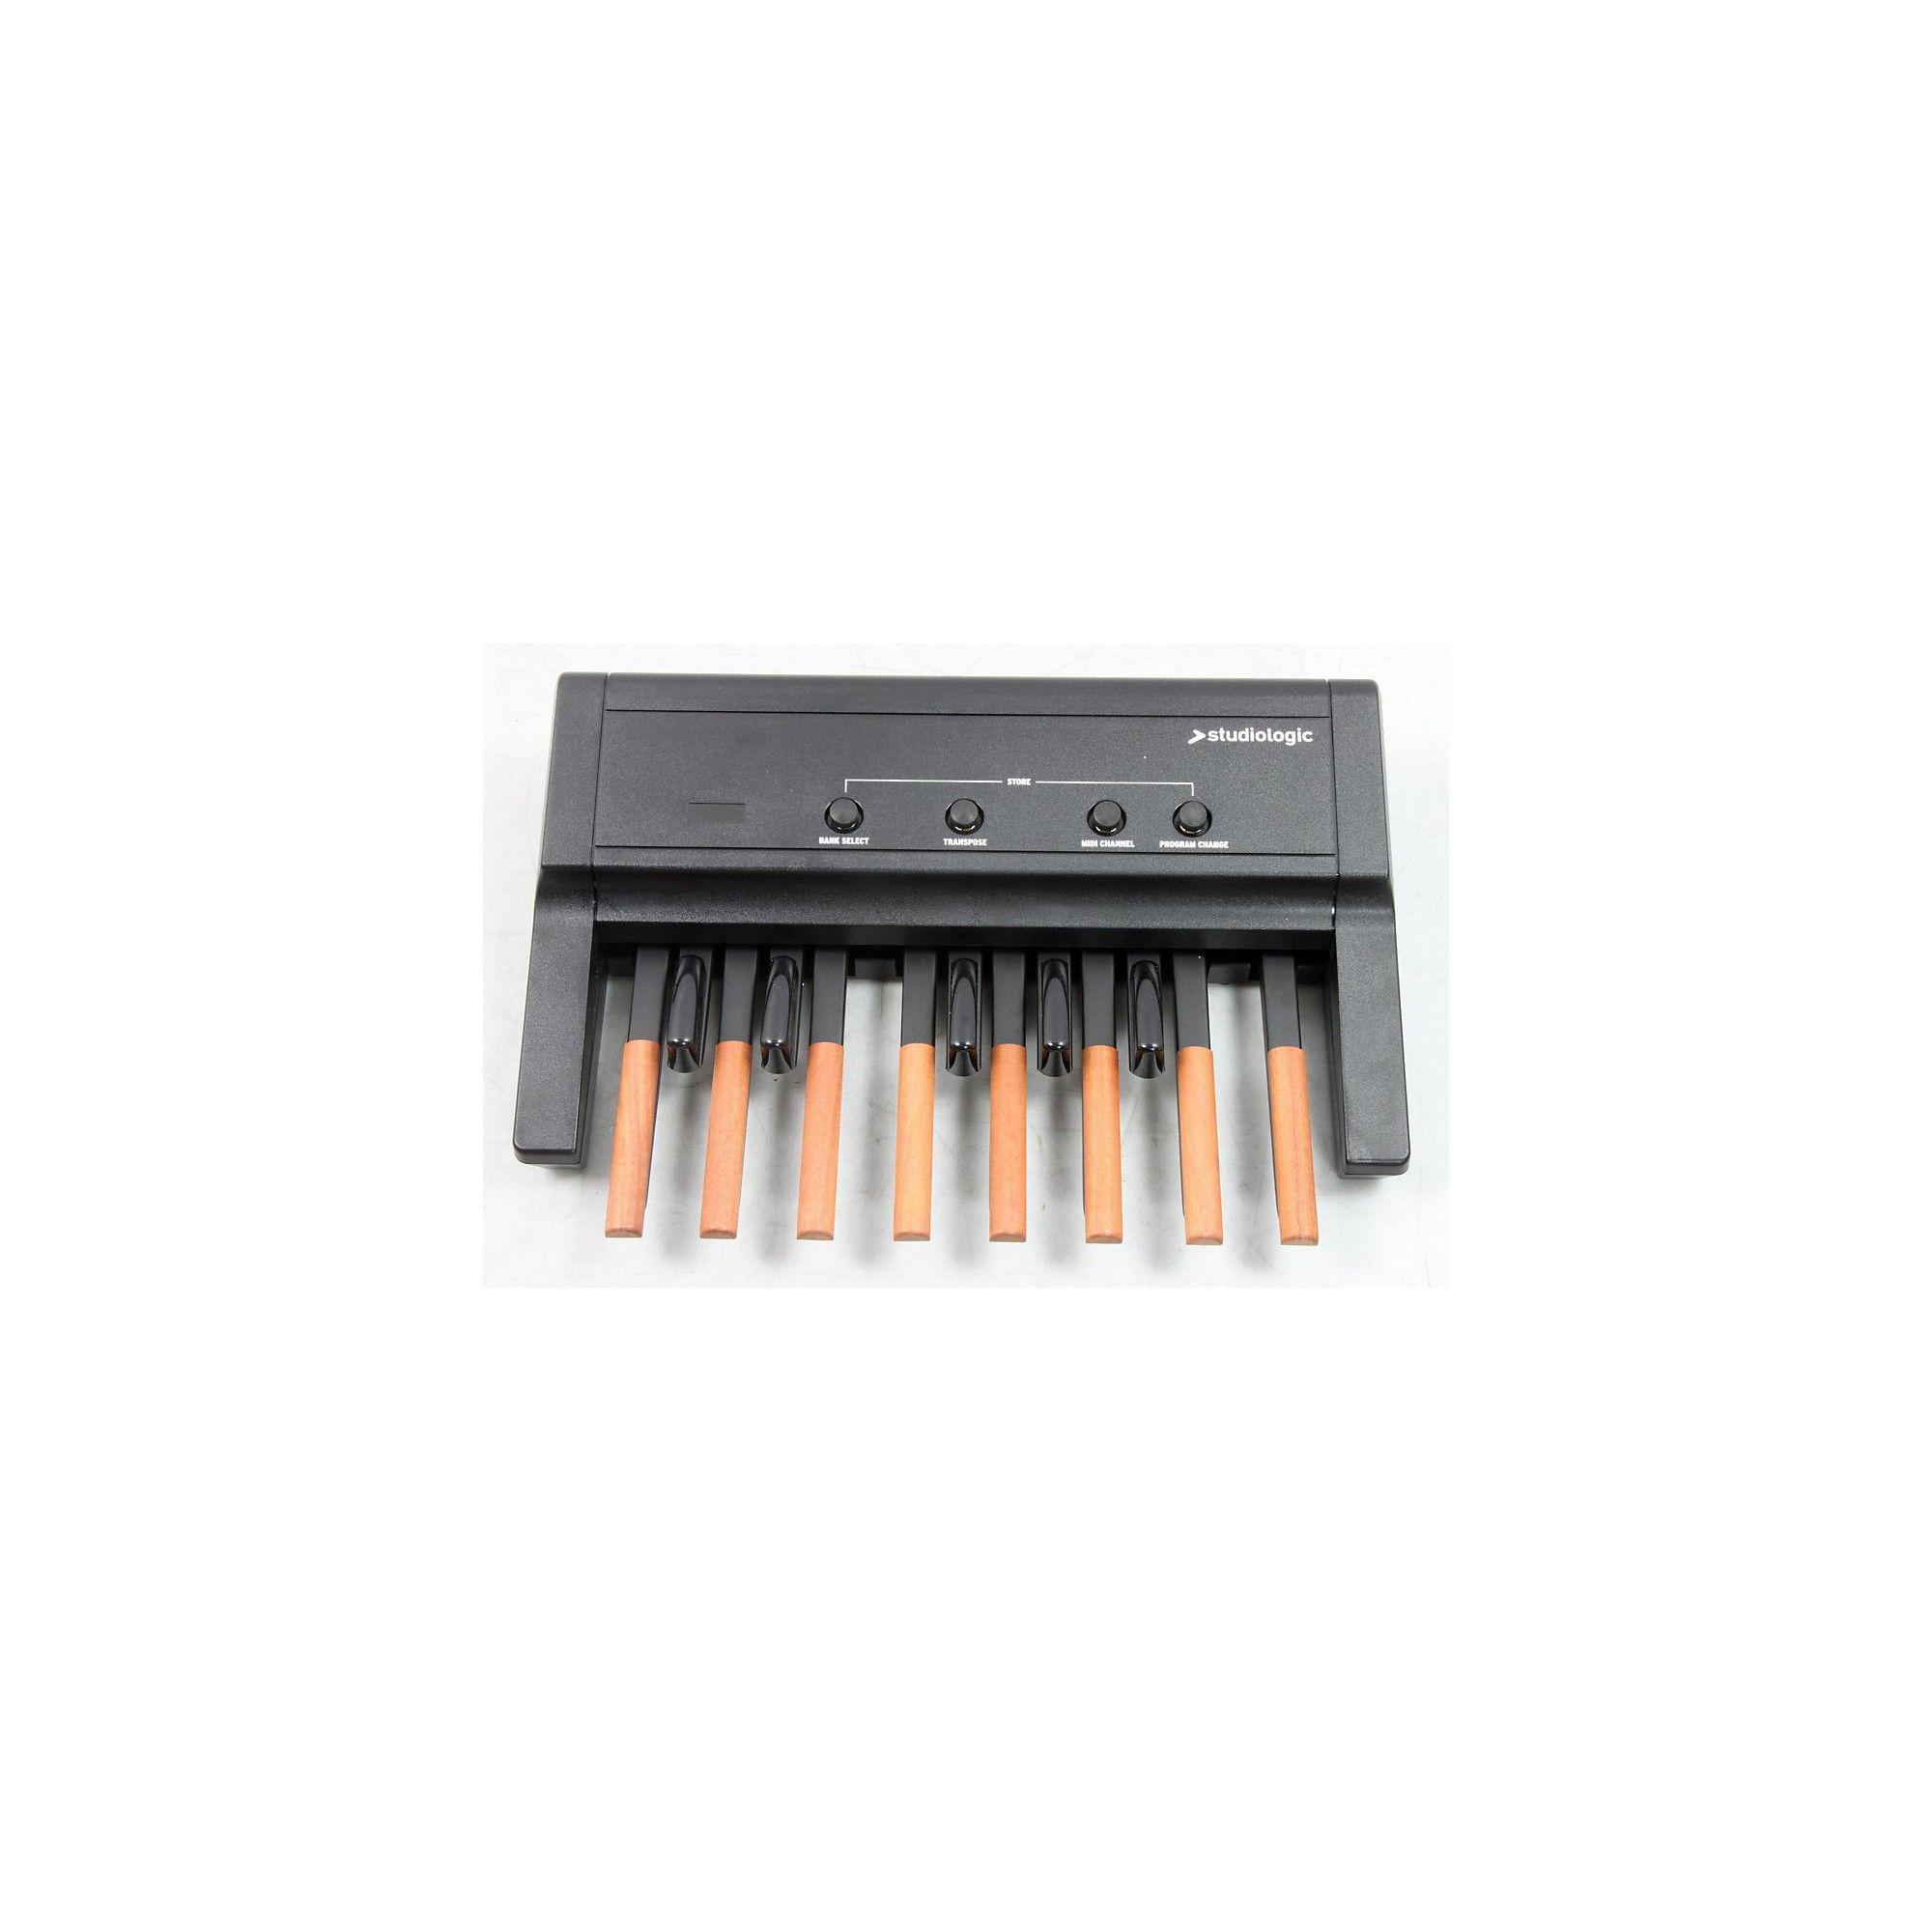 Studiologic MP-113 Dynamic MIDI Foot Controller Pedal Board